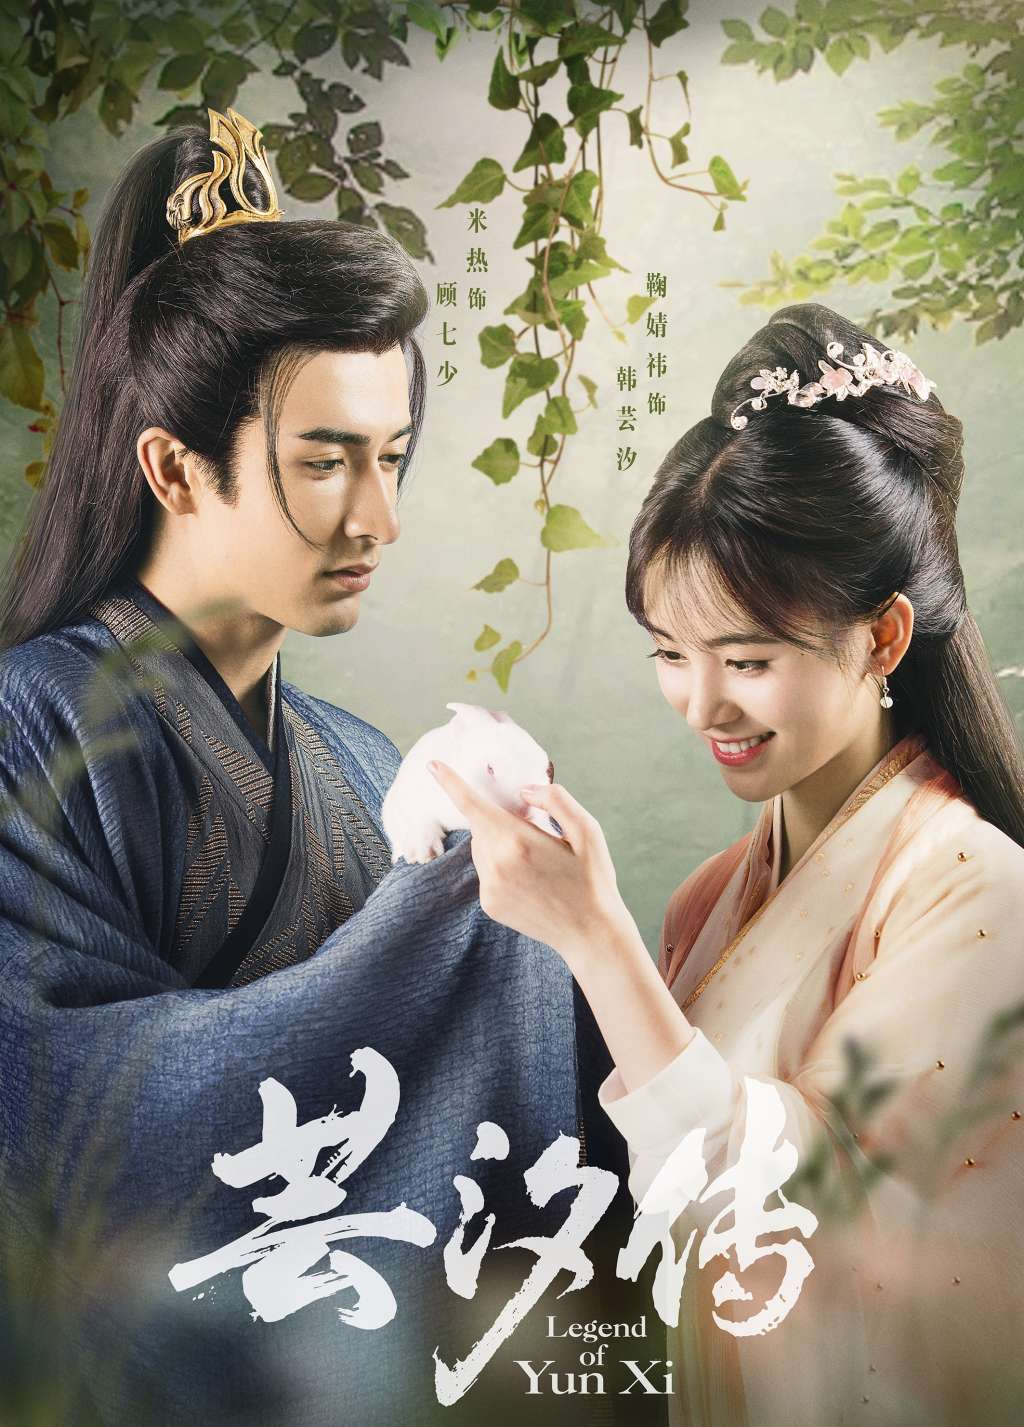 Legend of Yun Xi kapak